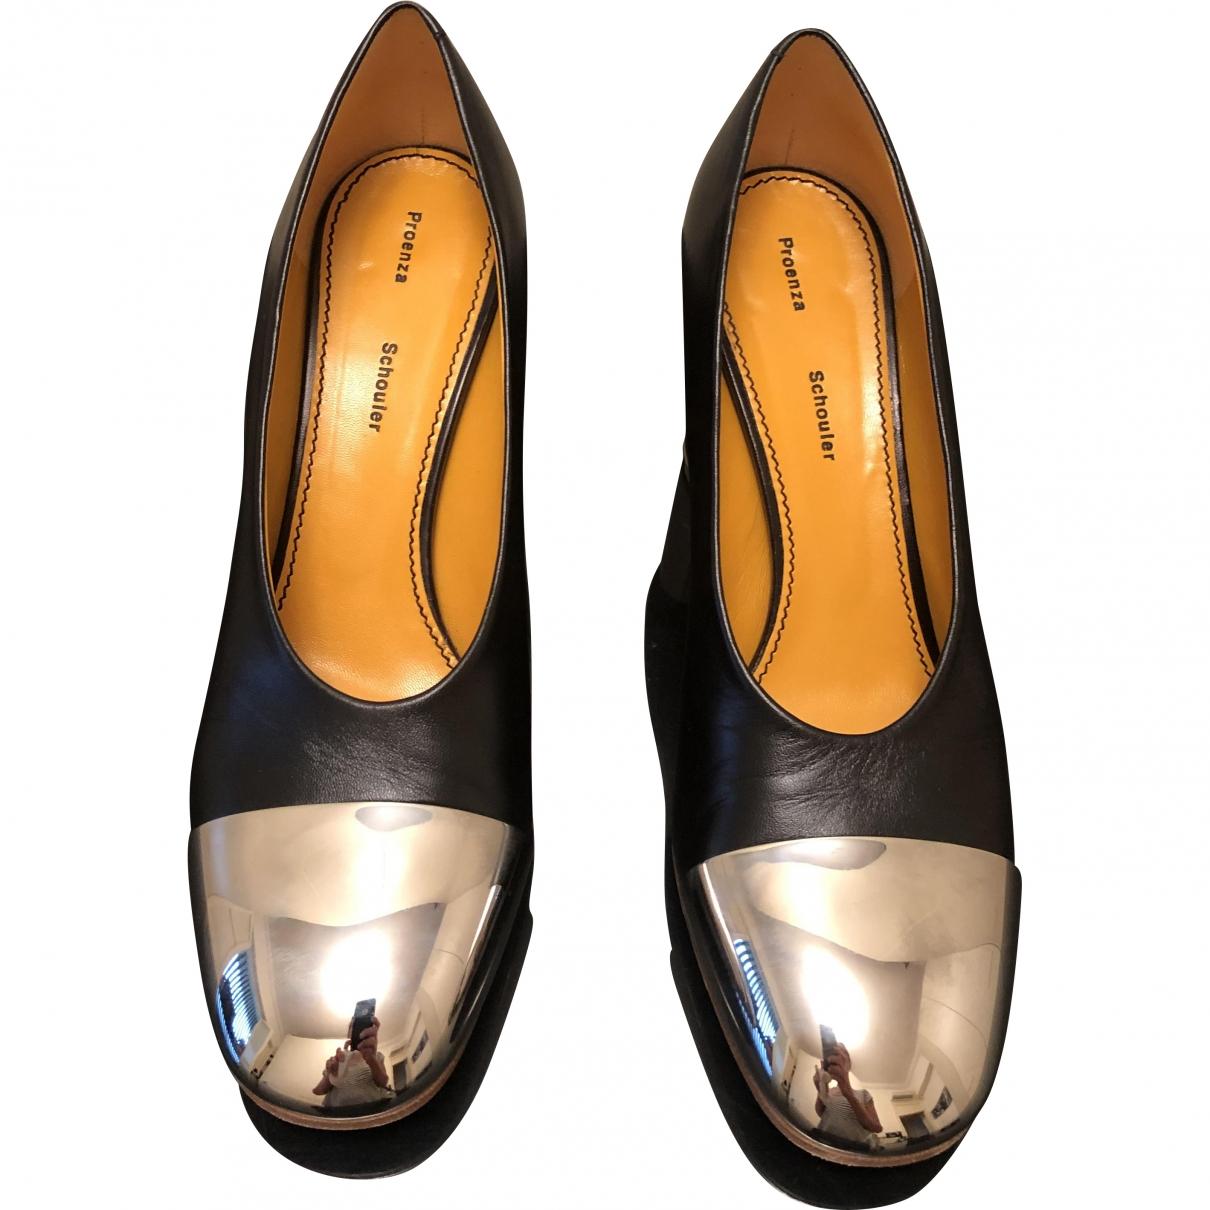 Proenza Schouler \N Black Leather Heels for Women 38.5 EU